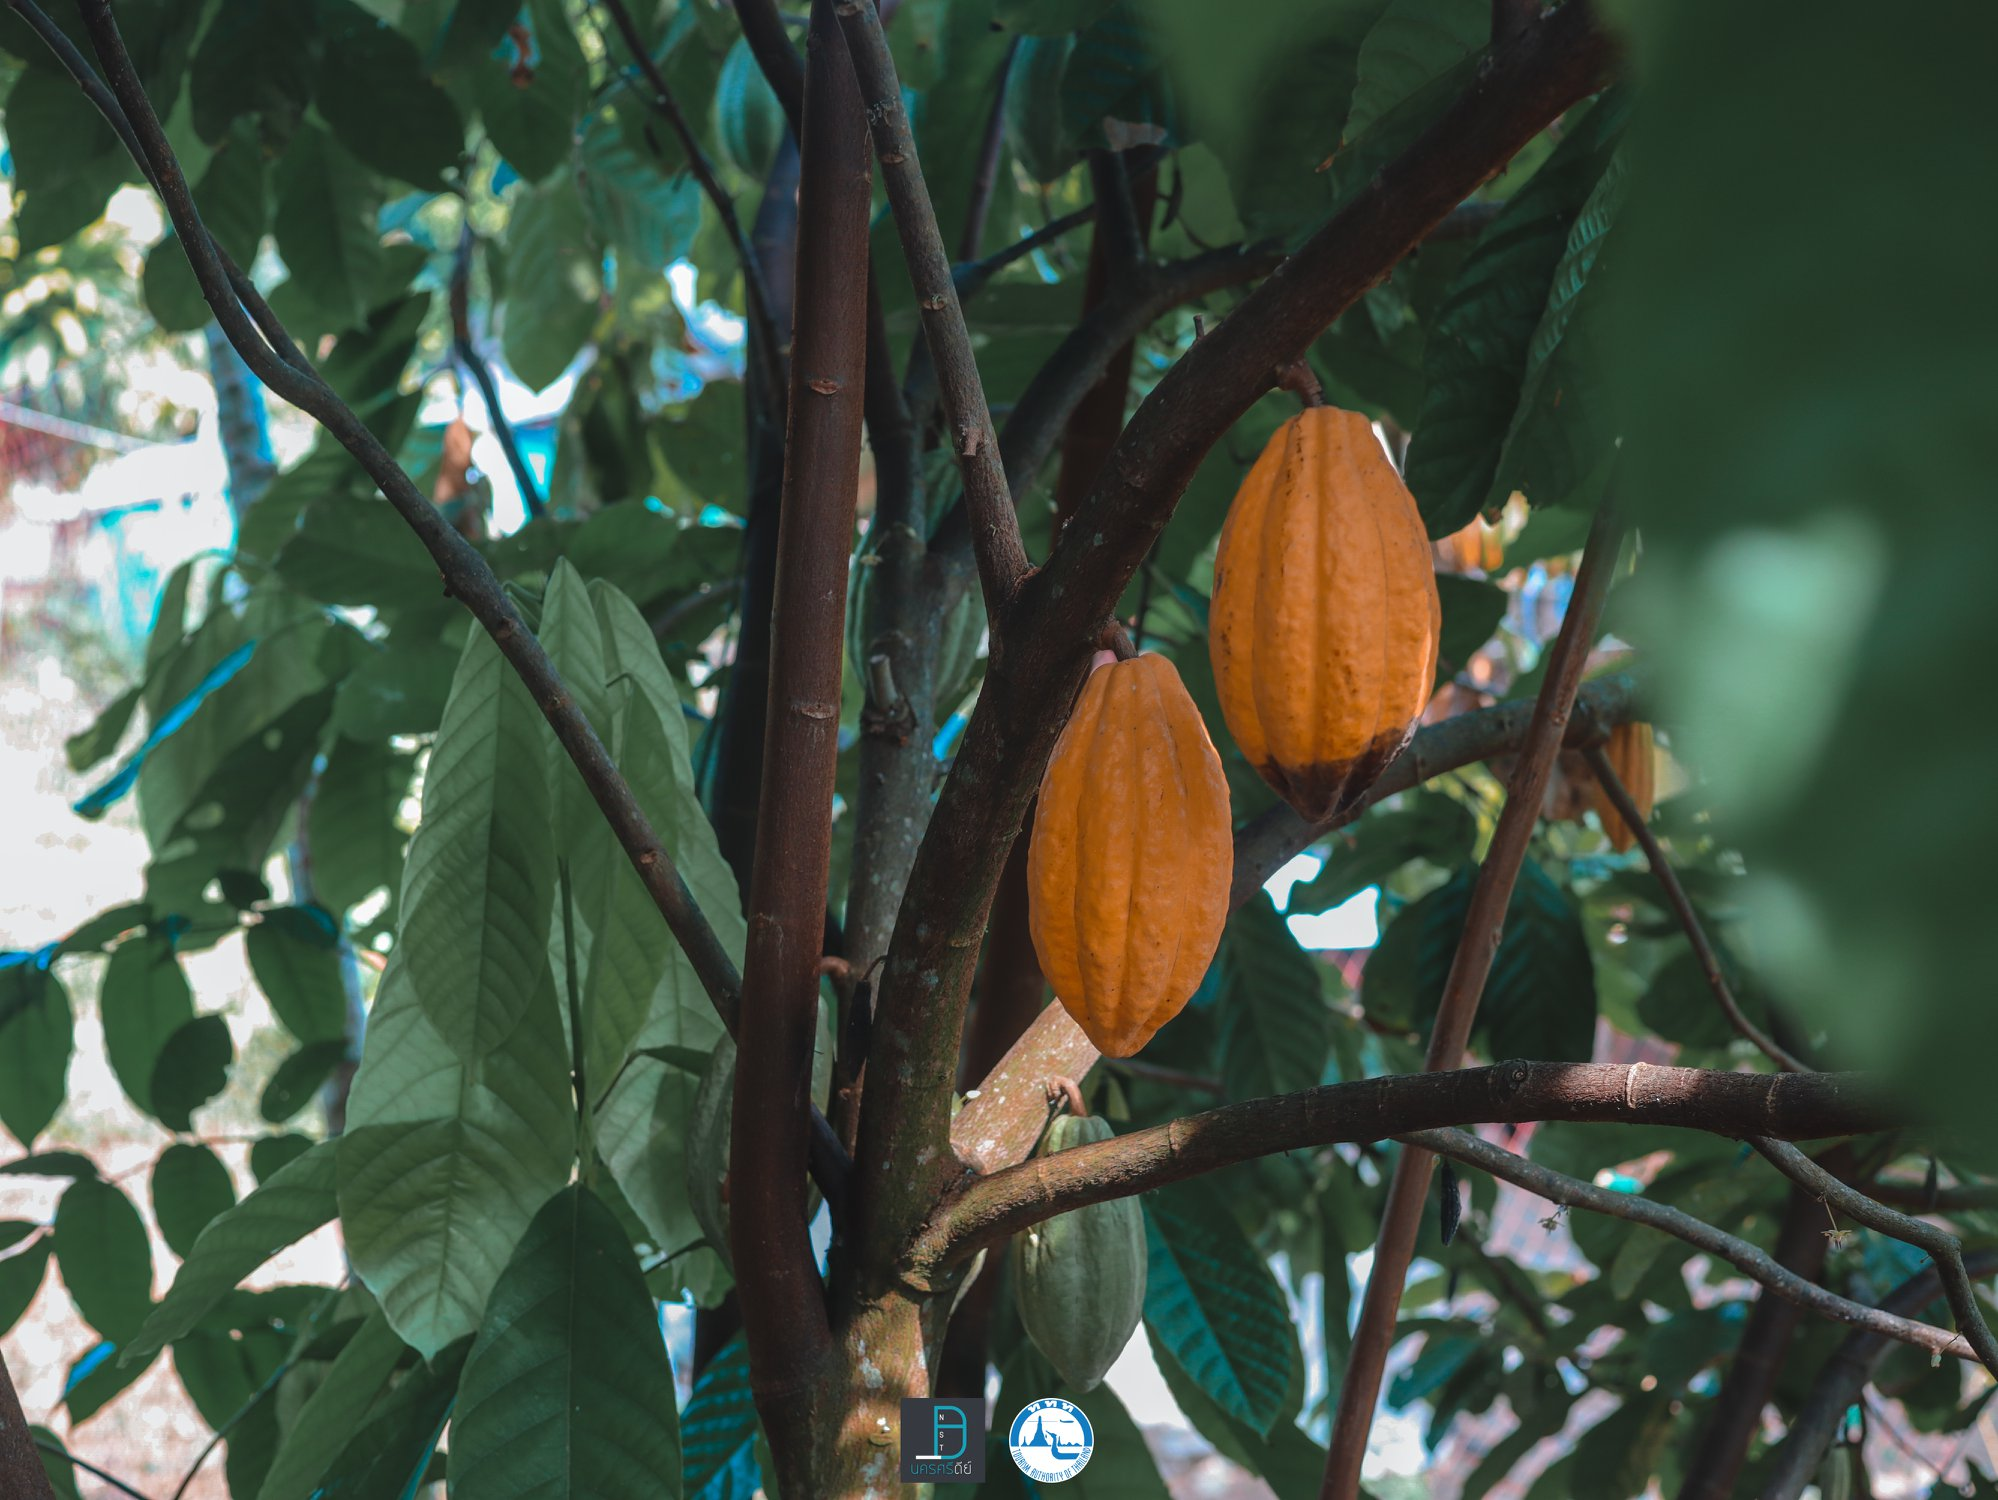 10.-Rose-Coco-Garden-พามาแวะ-การท่องเที่ยวเชิงโกโก้บ้าง-ที่นี่มีสอนทำการโกโก้ด้วยนะเออ-สาธิตตั้งแต่ต้นจนจบทำเป็นเลยครับ โกโก้,นครศรีธรรมราช,อร่อย,ergo,coffee,ของกิน,เครื่องดื่ม,คาเฟ่